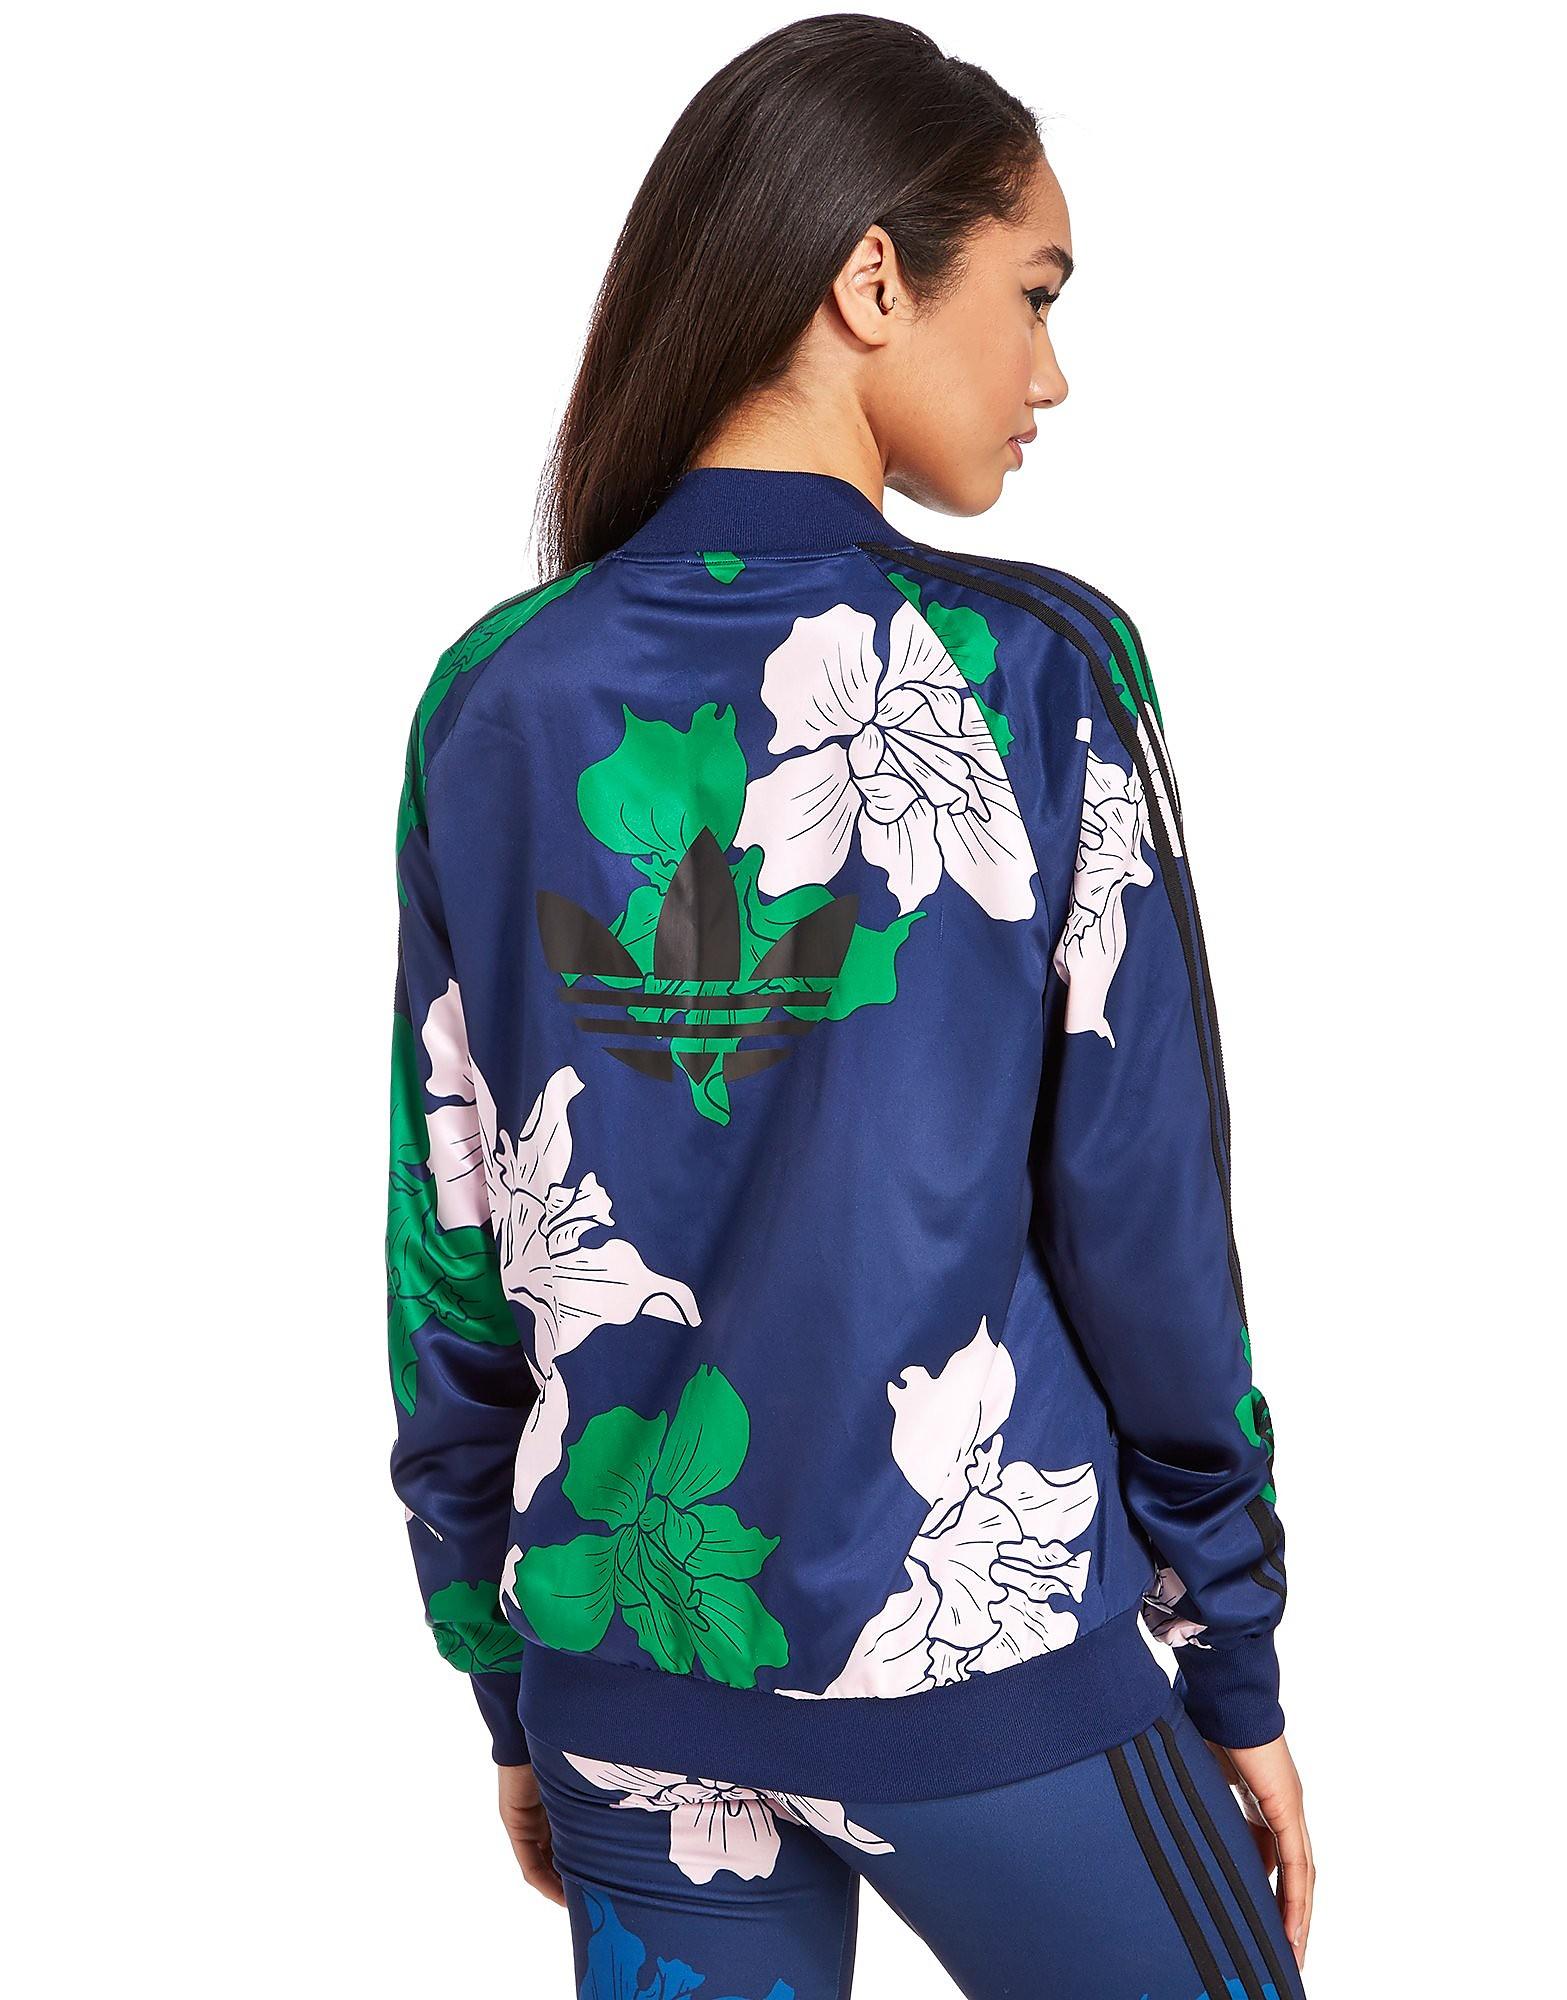 adidas Originals Floral Engraving Superstar Track Top